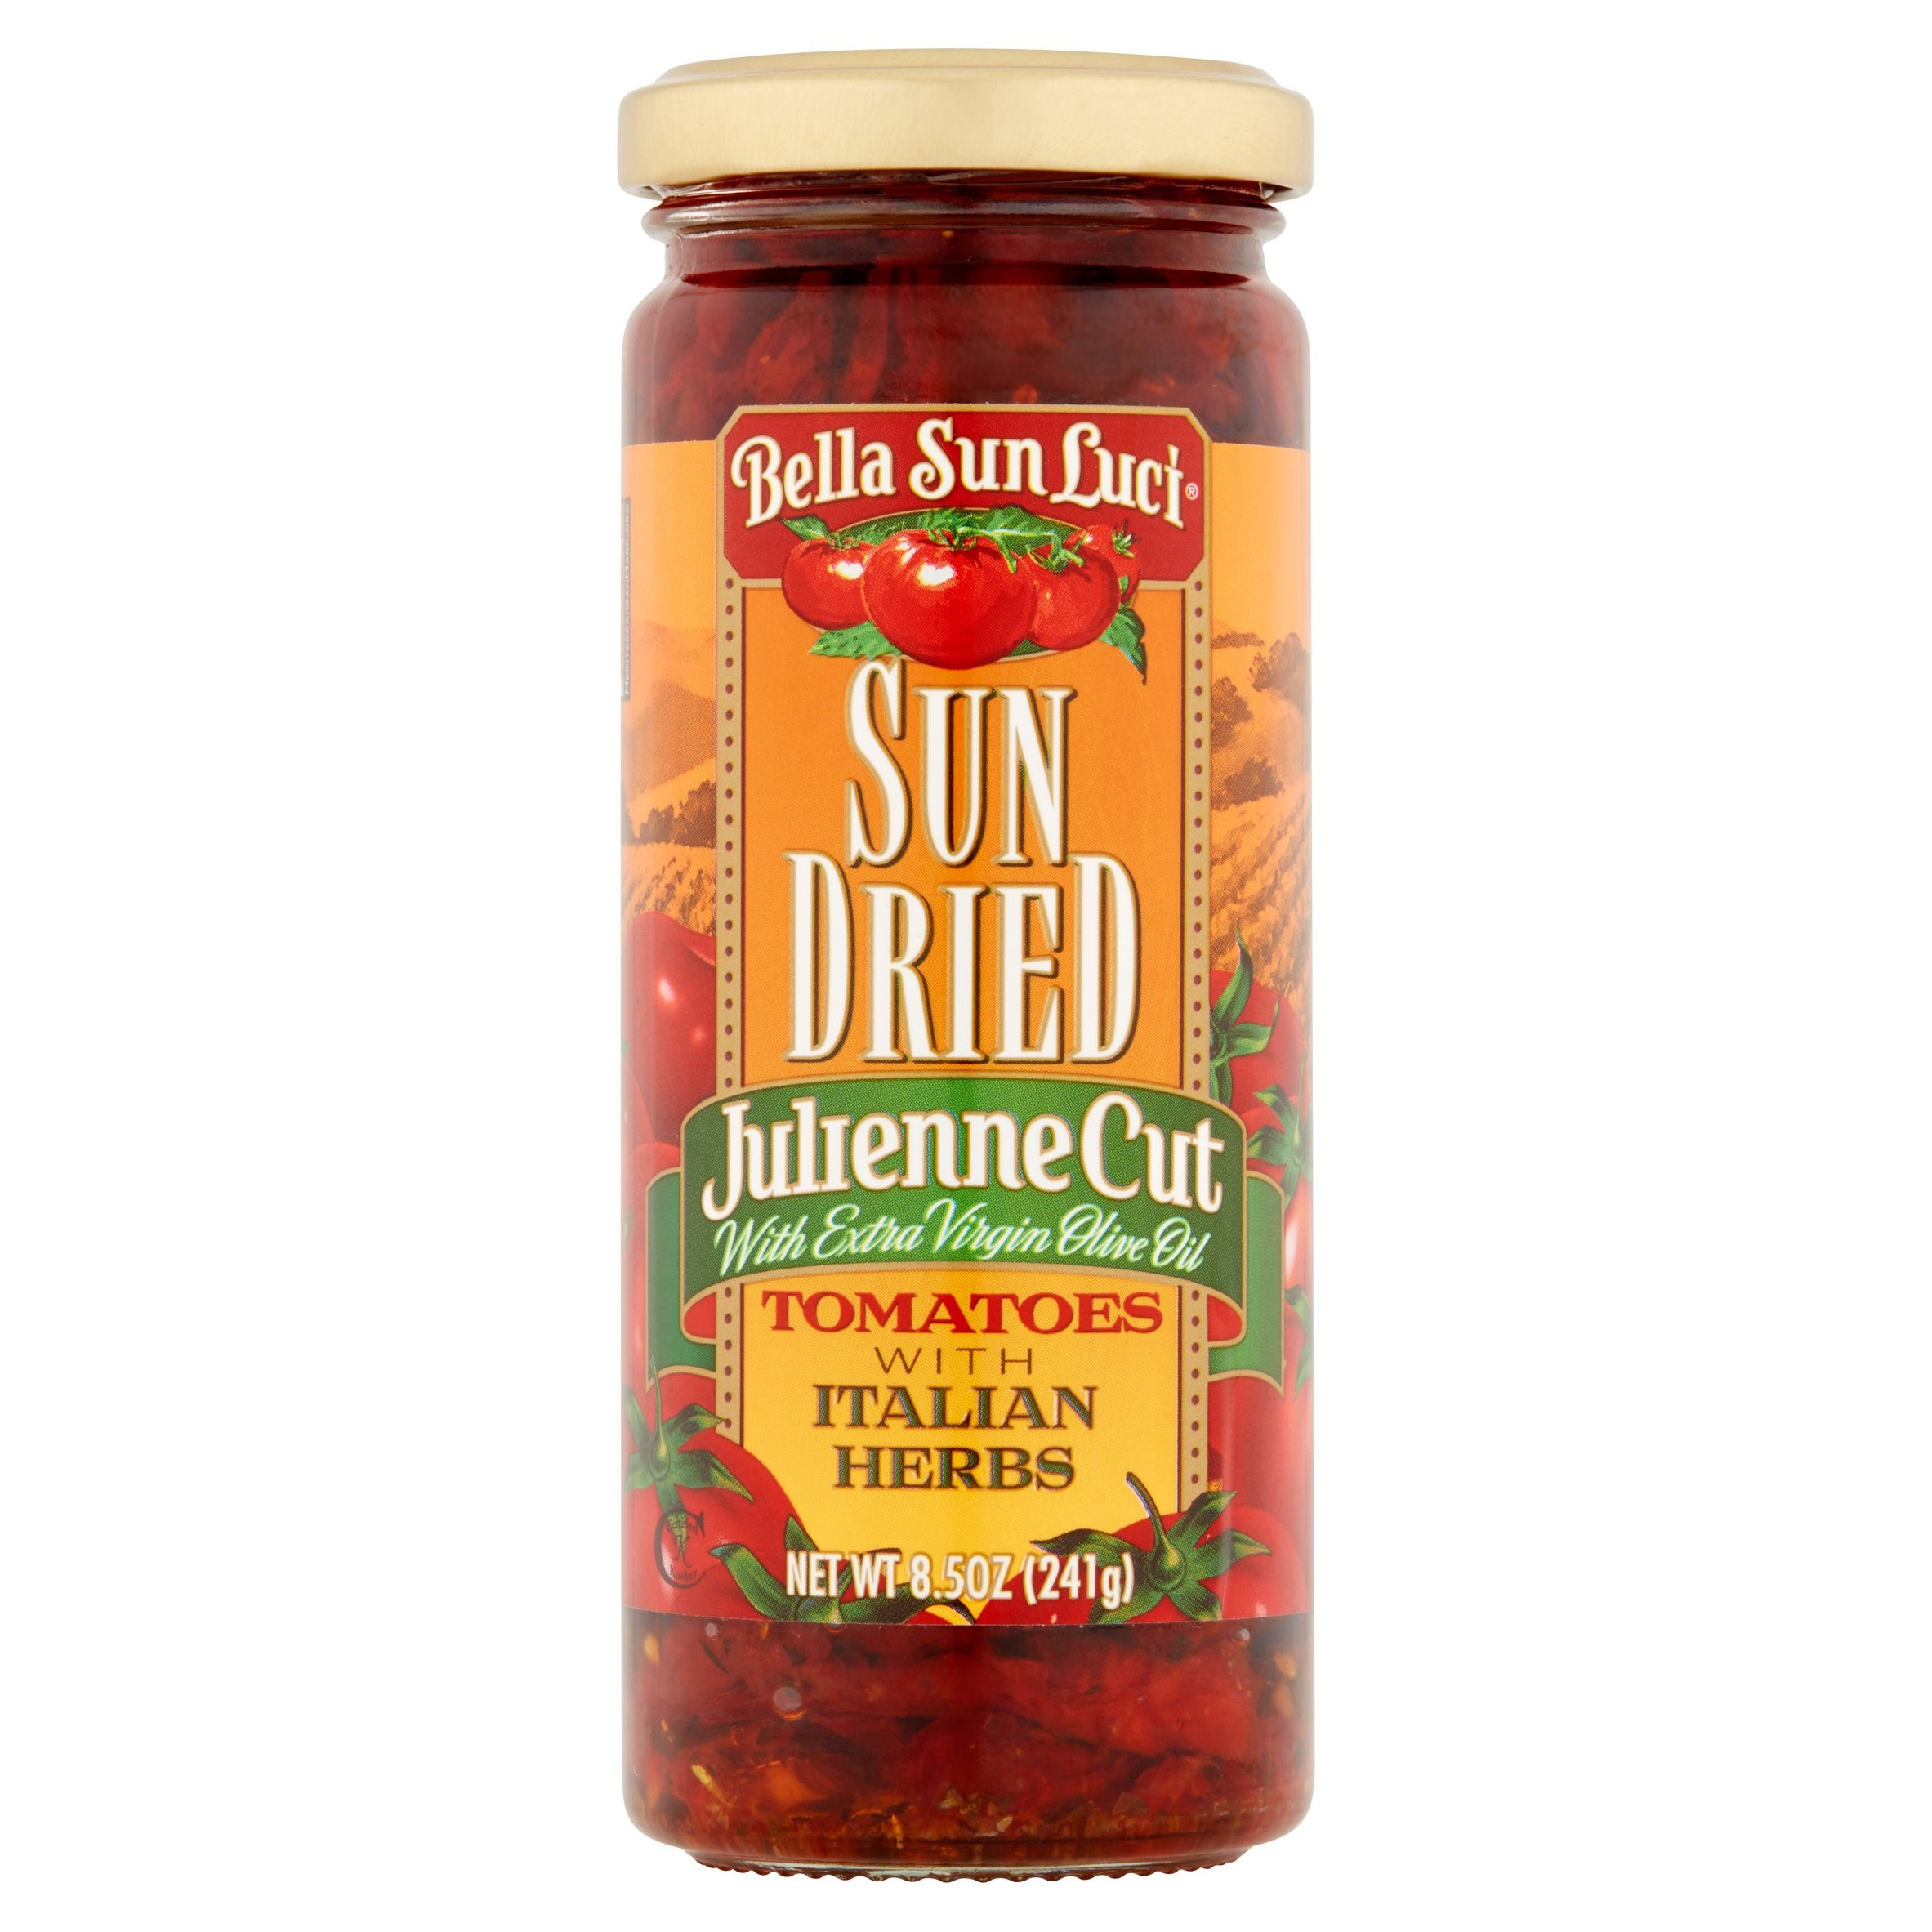 Bella Sun Luci Julienne Cut Sun Dried Tomatoes with Italian Herbs, 8.5 oz